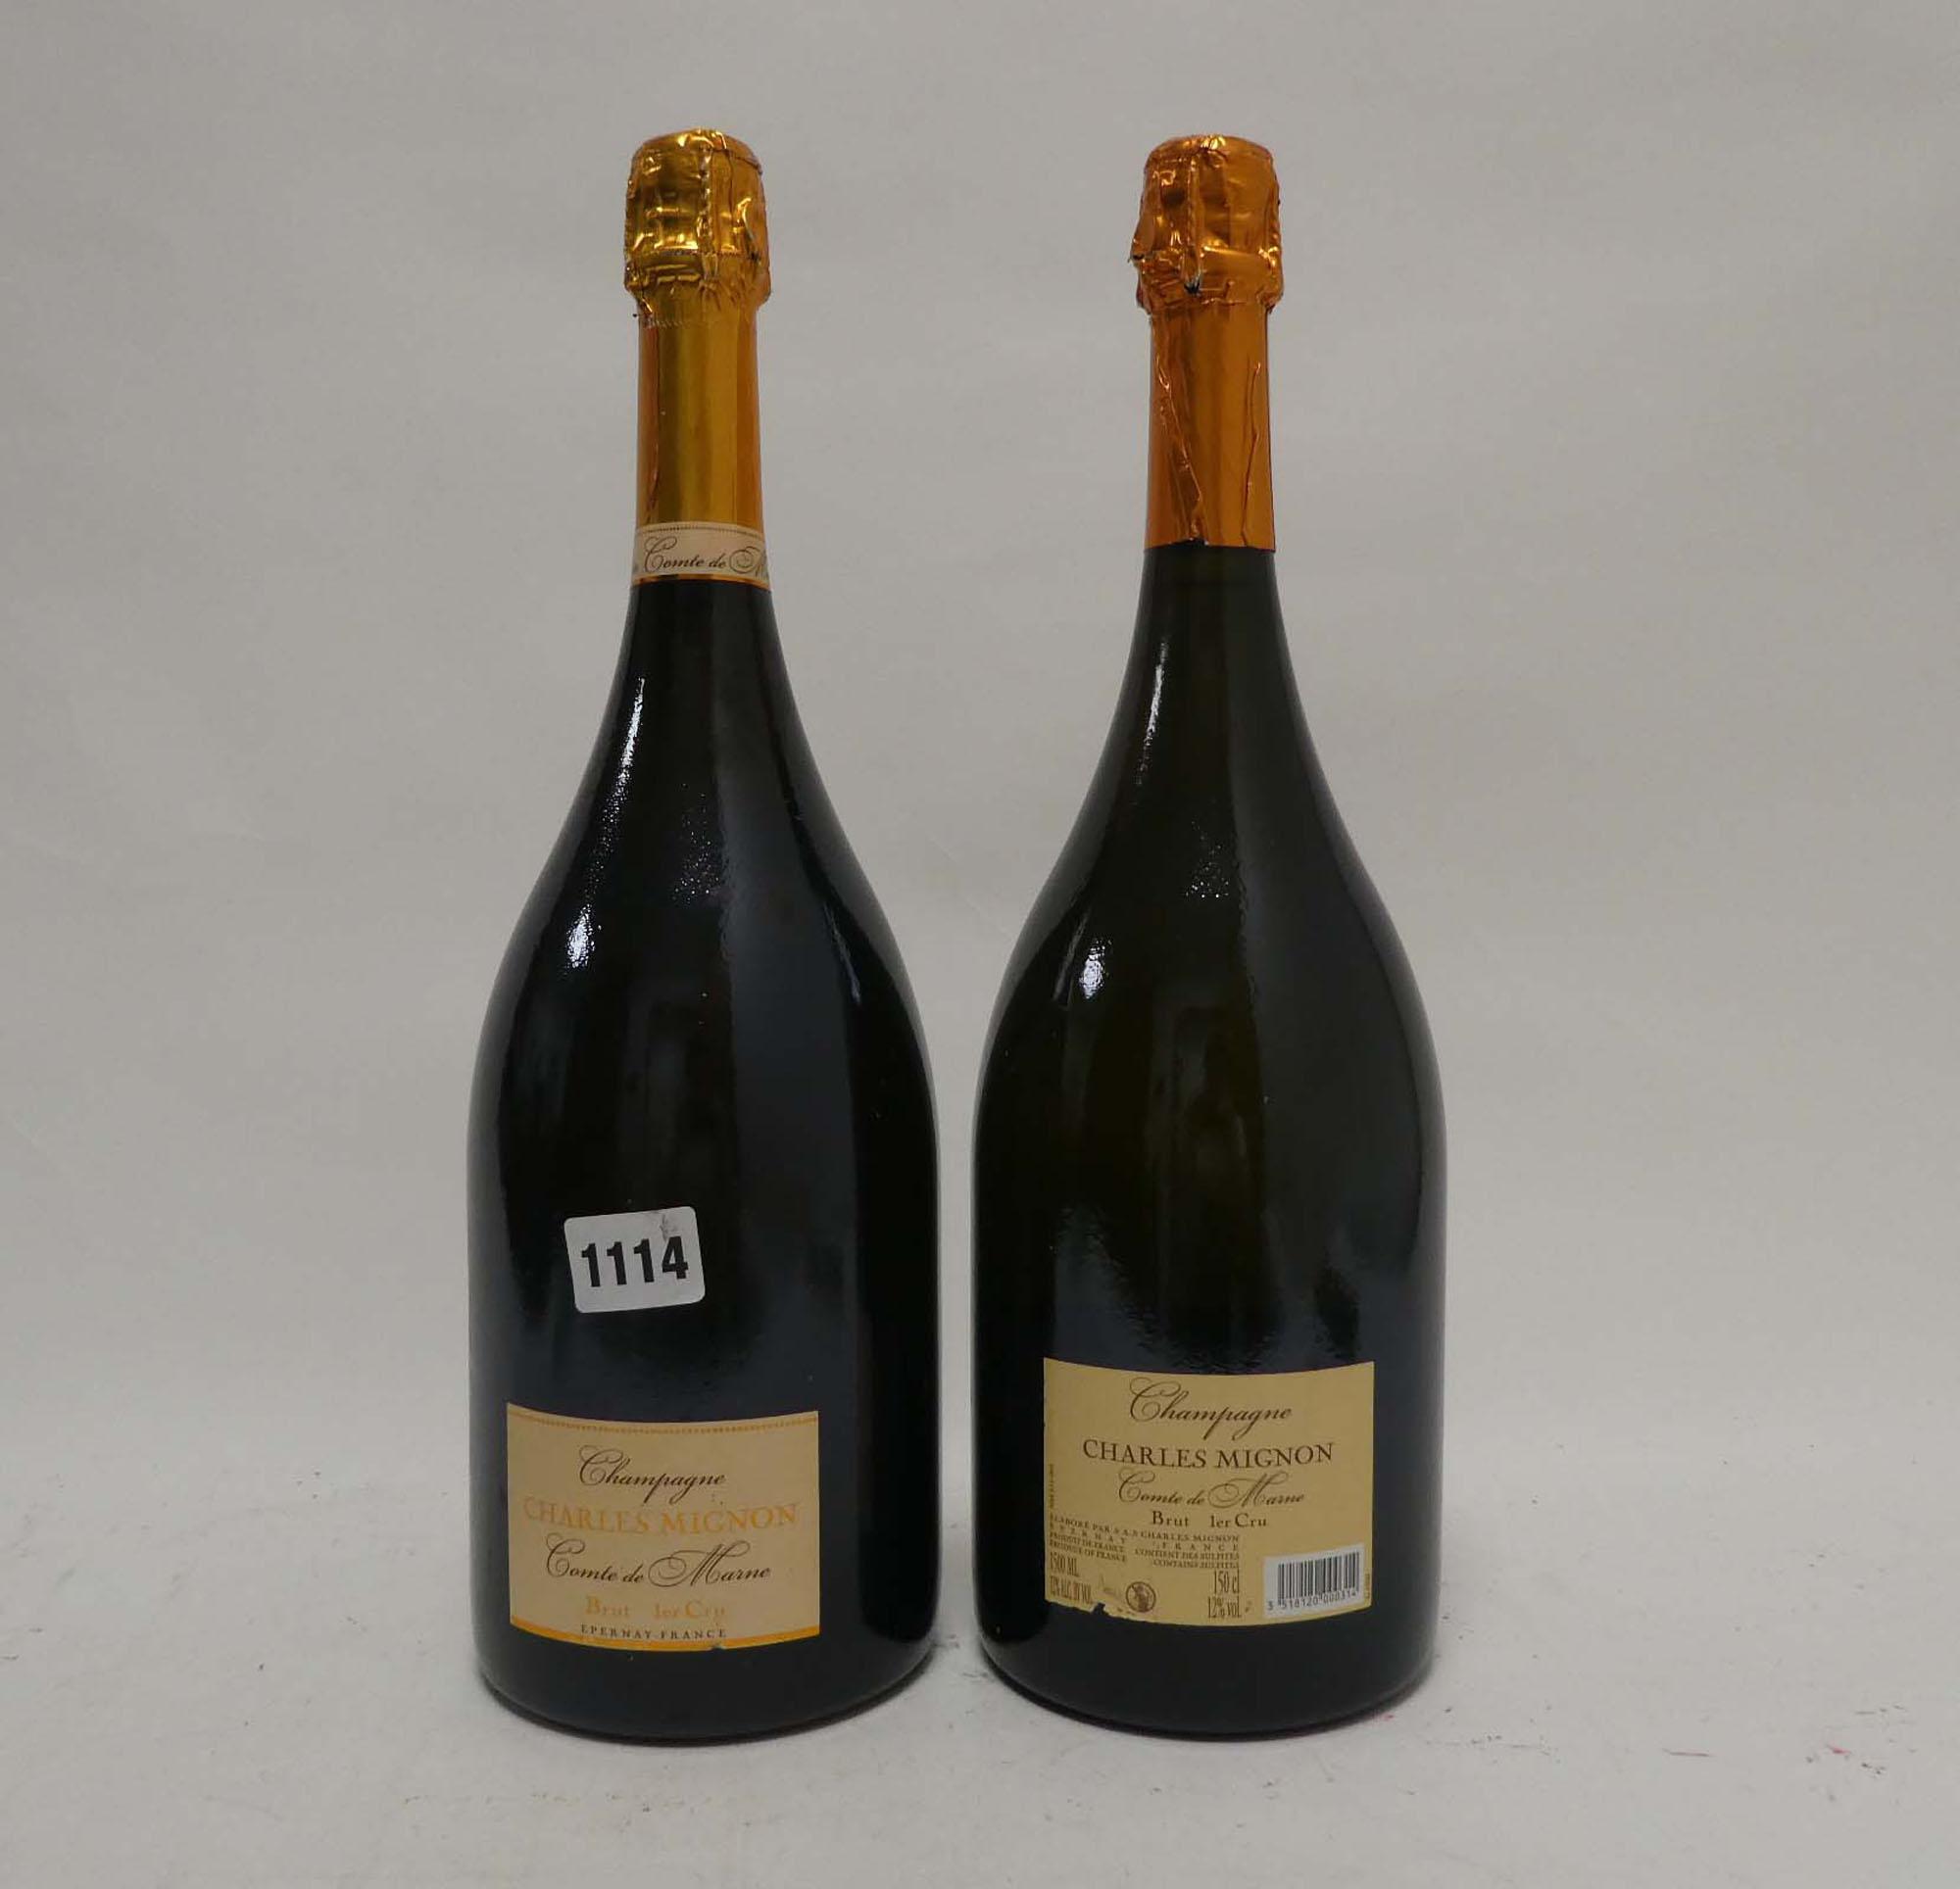 2 Magnums of Charles Mignon Comte De Marne Premier Cru Brut Champagne 150cl 12% each - Image 2 of 2